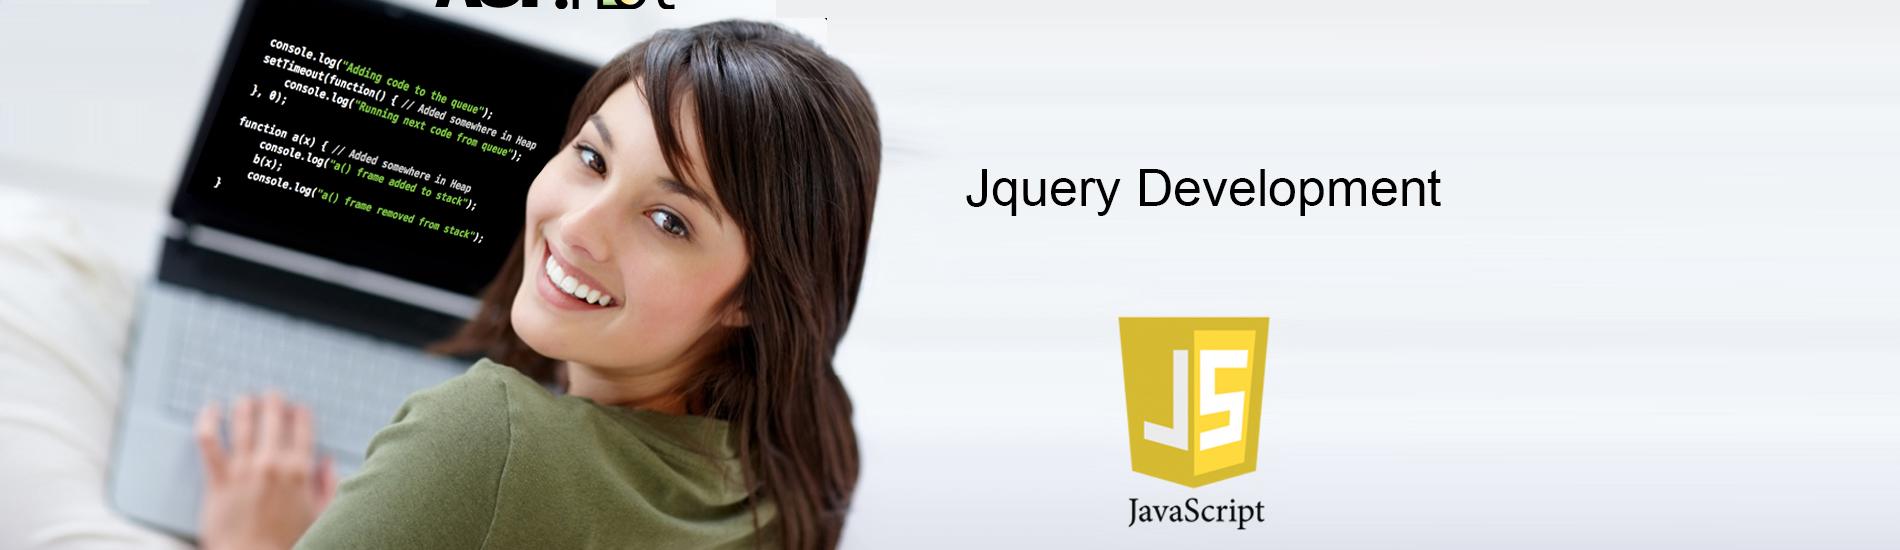 jquery-banner